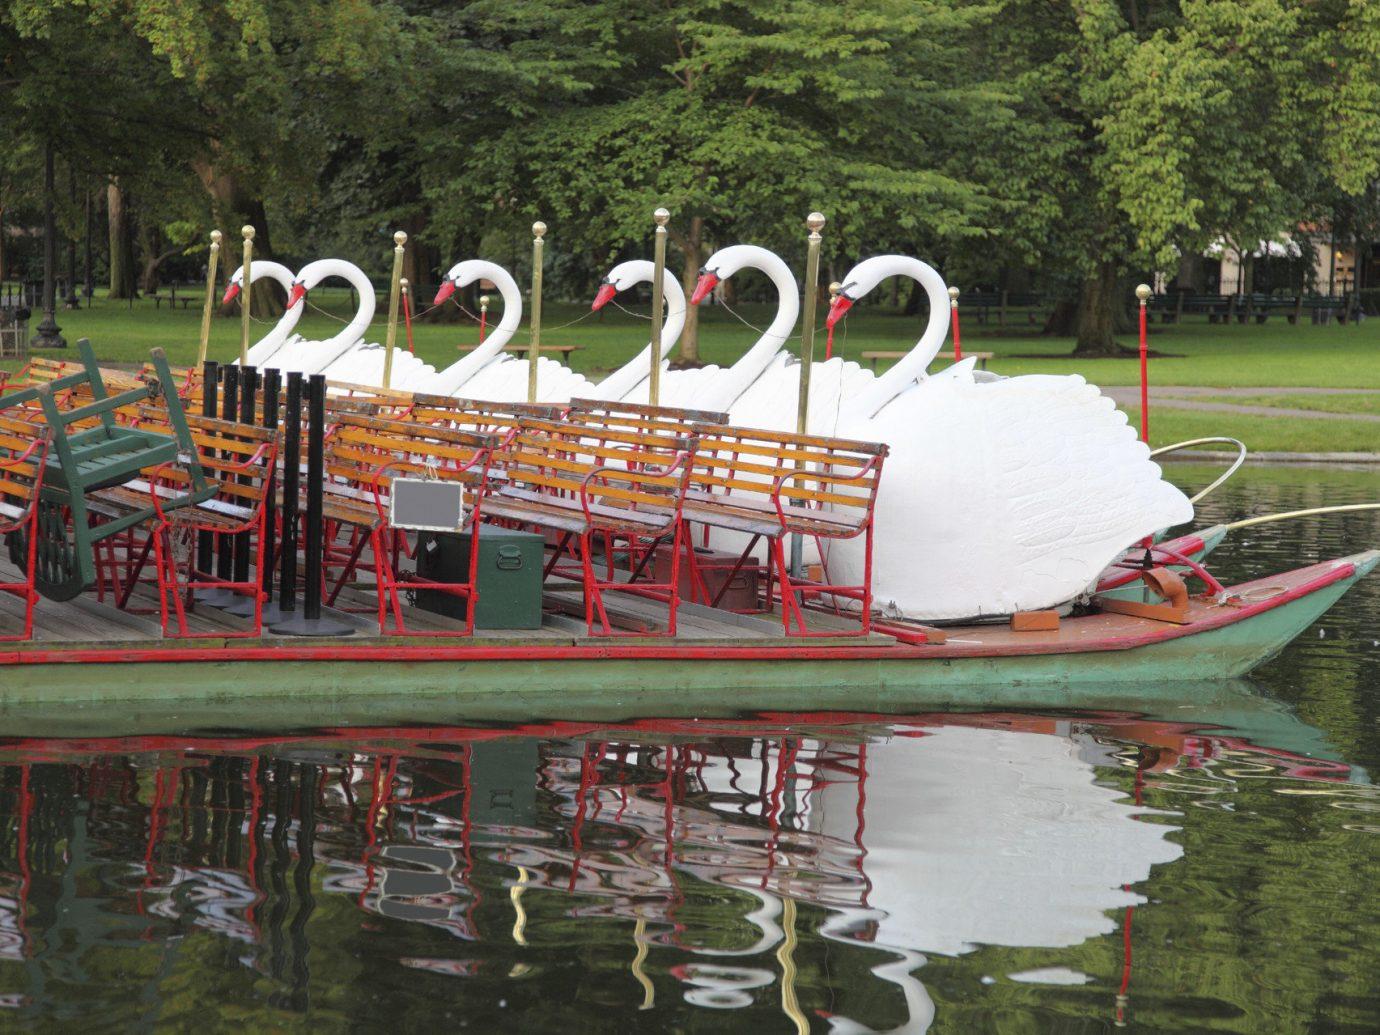 Family Travel Trip Ideas Weekend Getaways tree water outdoor Boat River boating park amusement park vehicle Lake waterway amusement ride Playground Raft dock